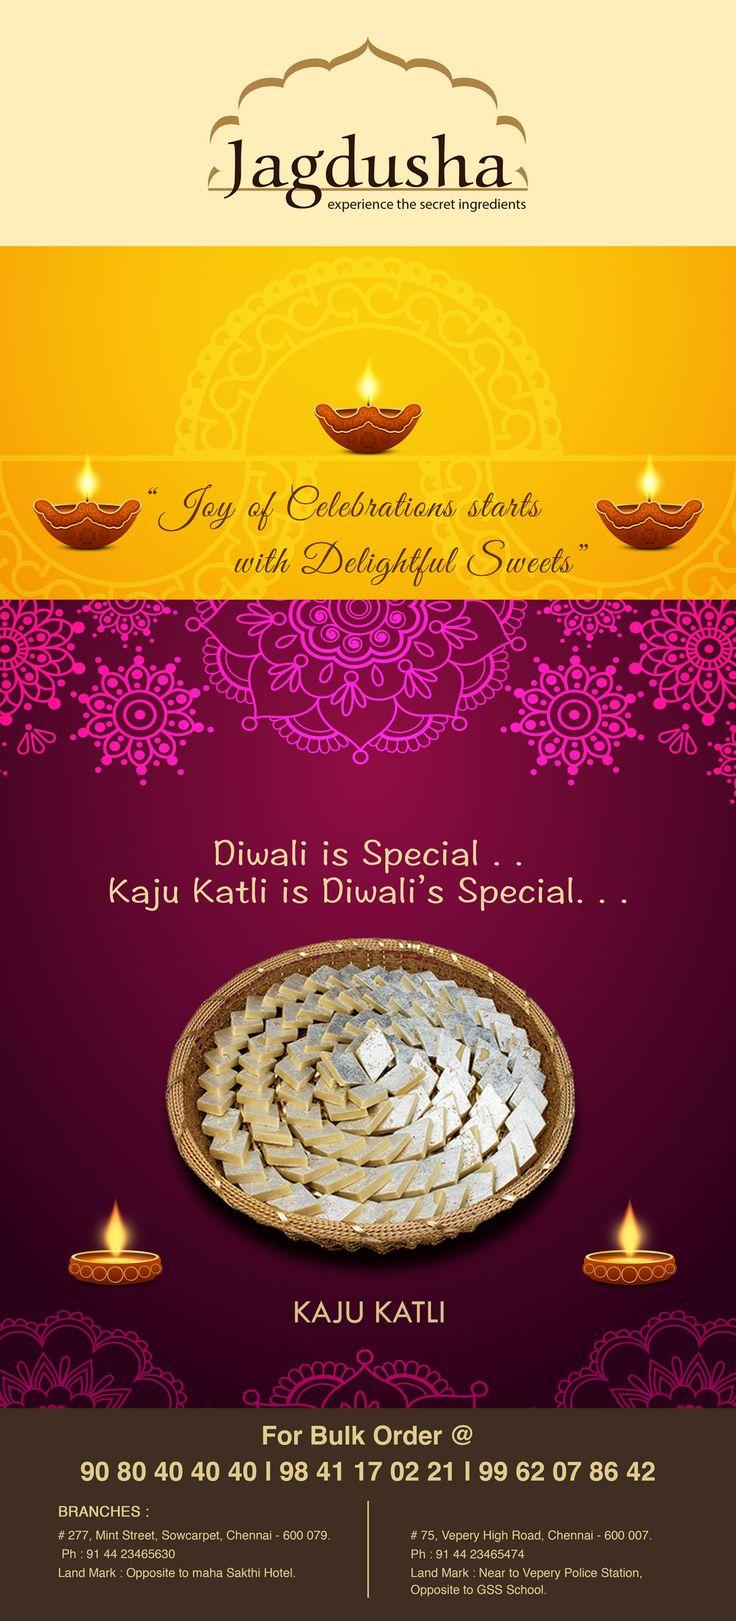 Enjoy the True taste of Kaju katli with Jagdusha Sweets & Savories. . .It's time to taste and celebrate the happiness..